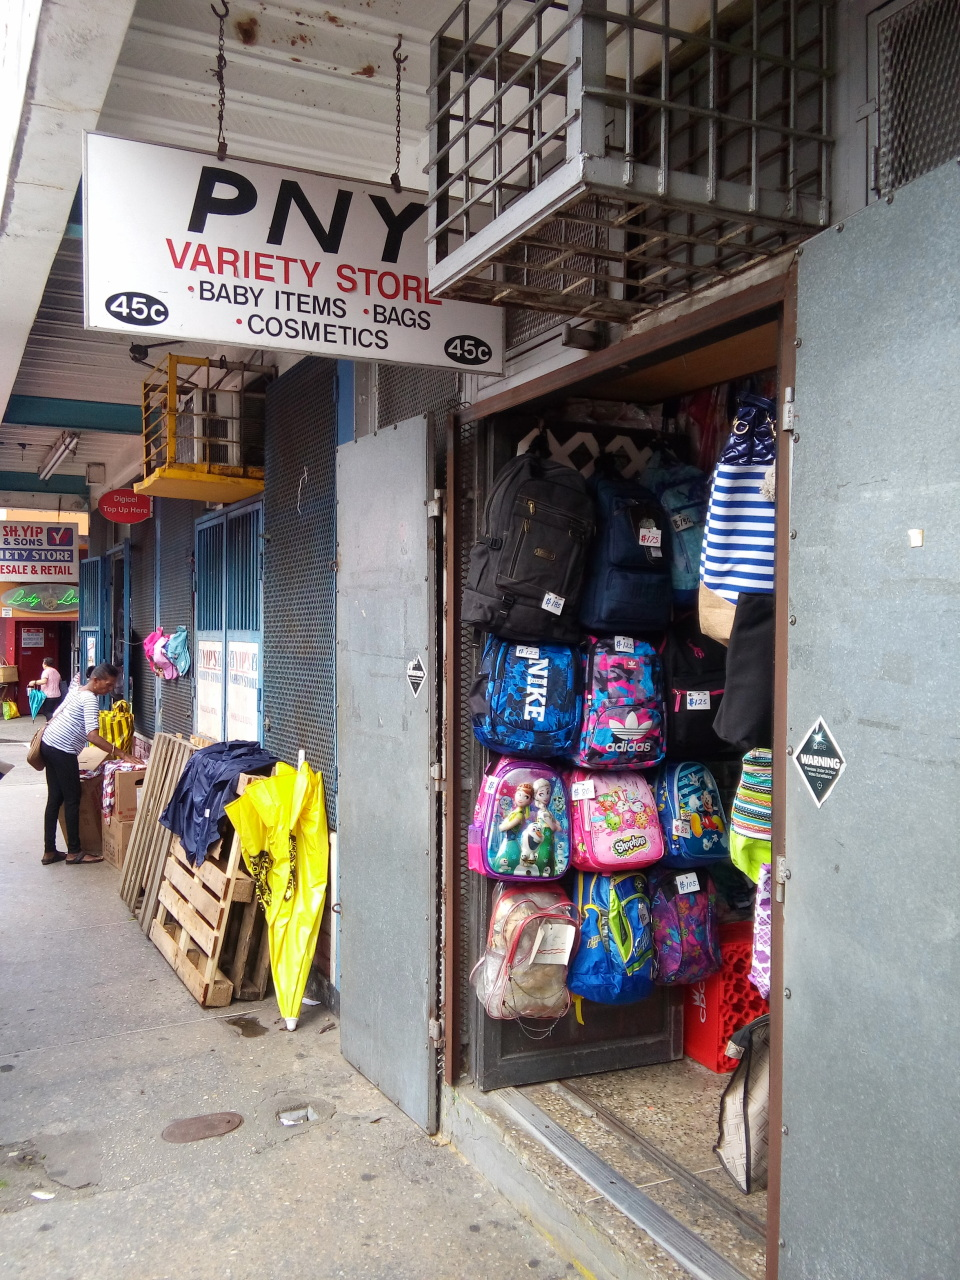 PNY Variety Store